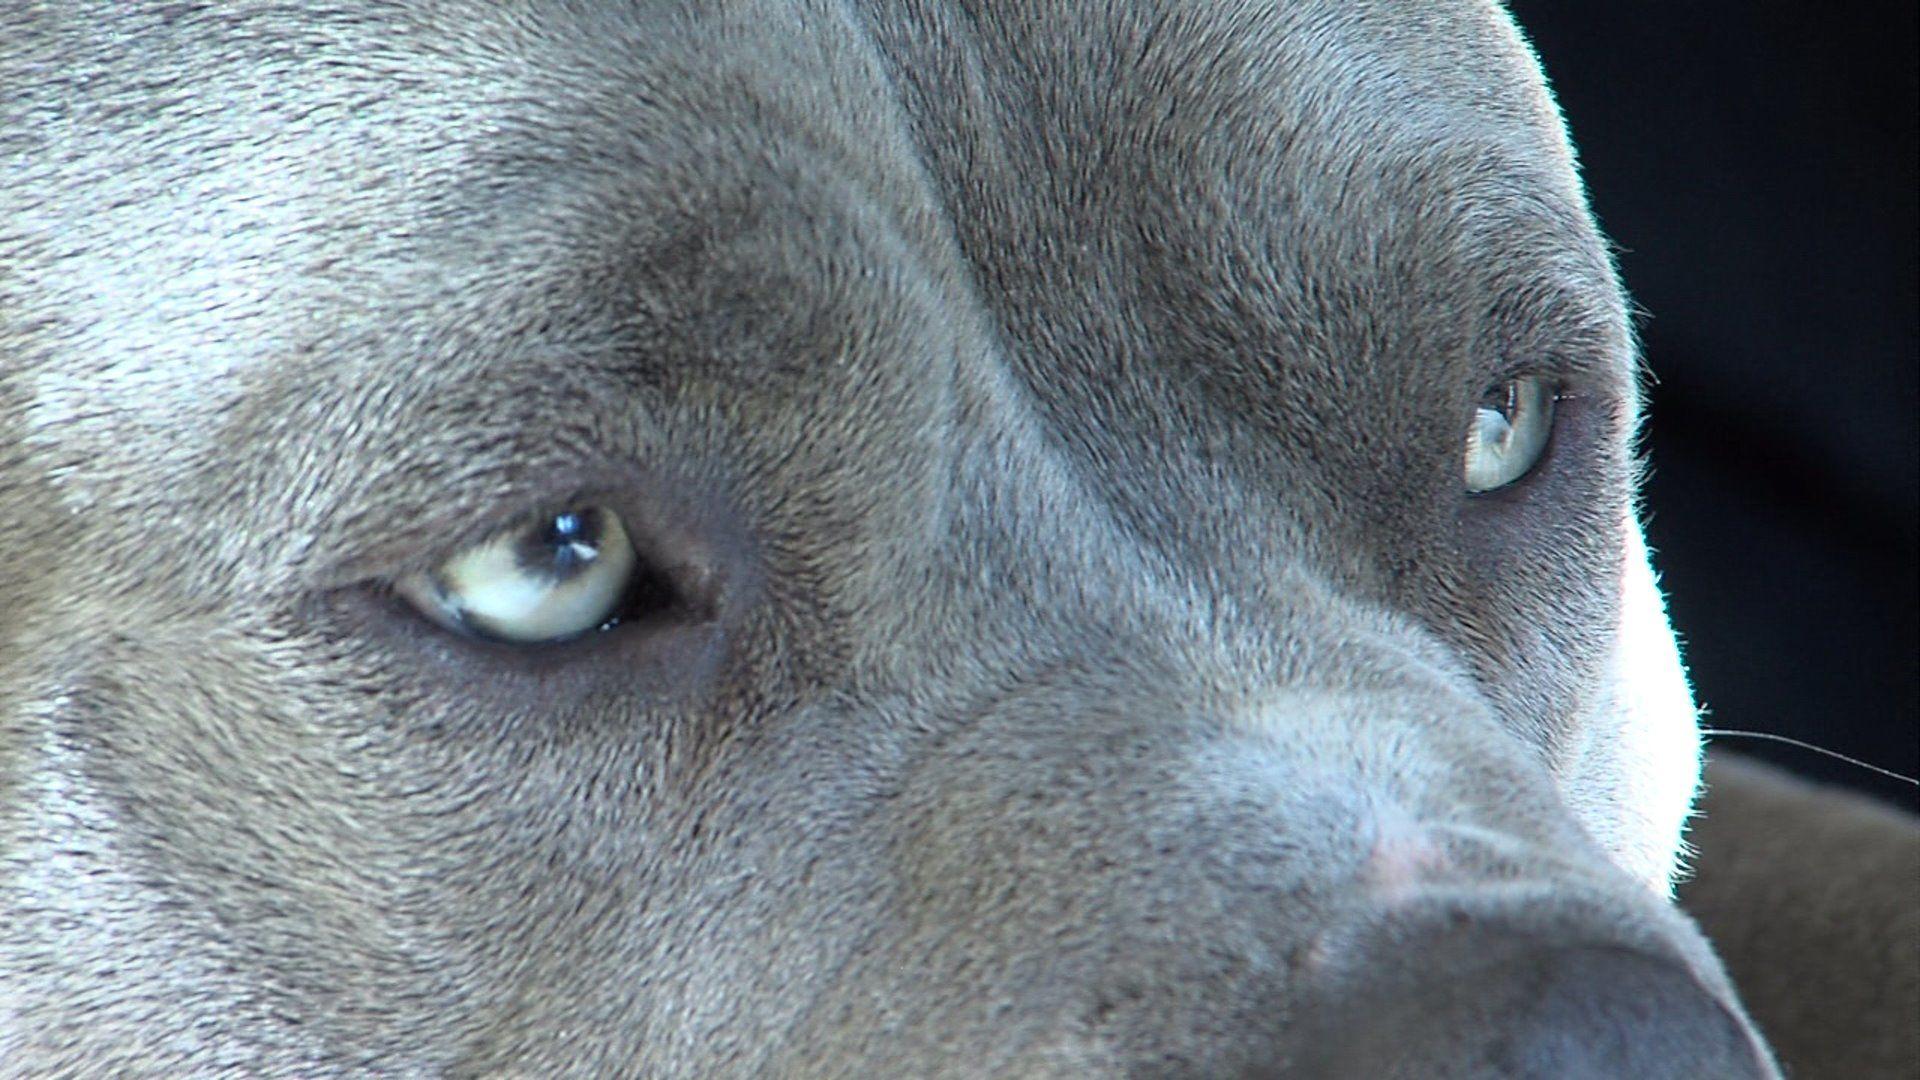 hd wallpapers pitbull dog wallpapers pitbulls pinterest dog 1600